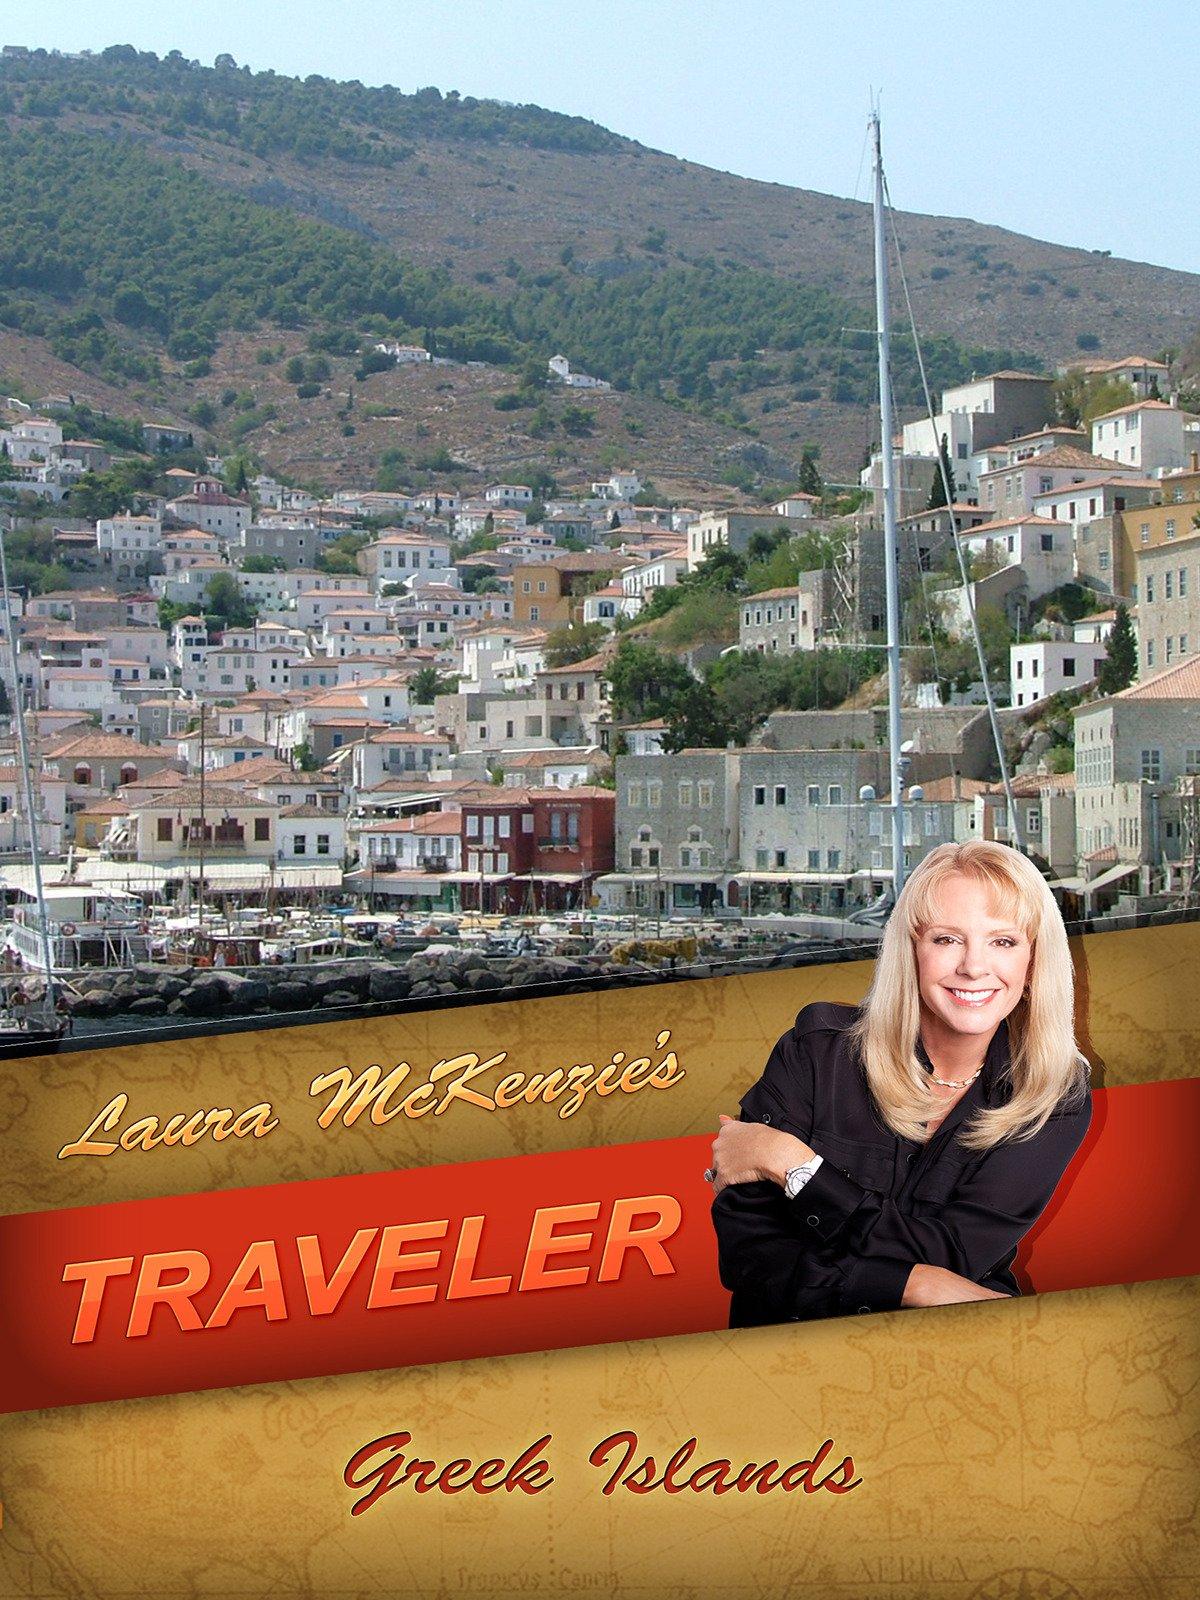 Laura McKenzie's Traveler - The Greek Islands on Amazon Prime Video UK